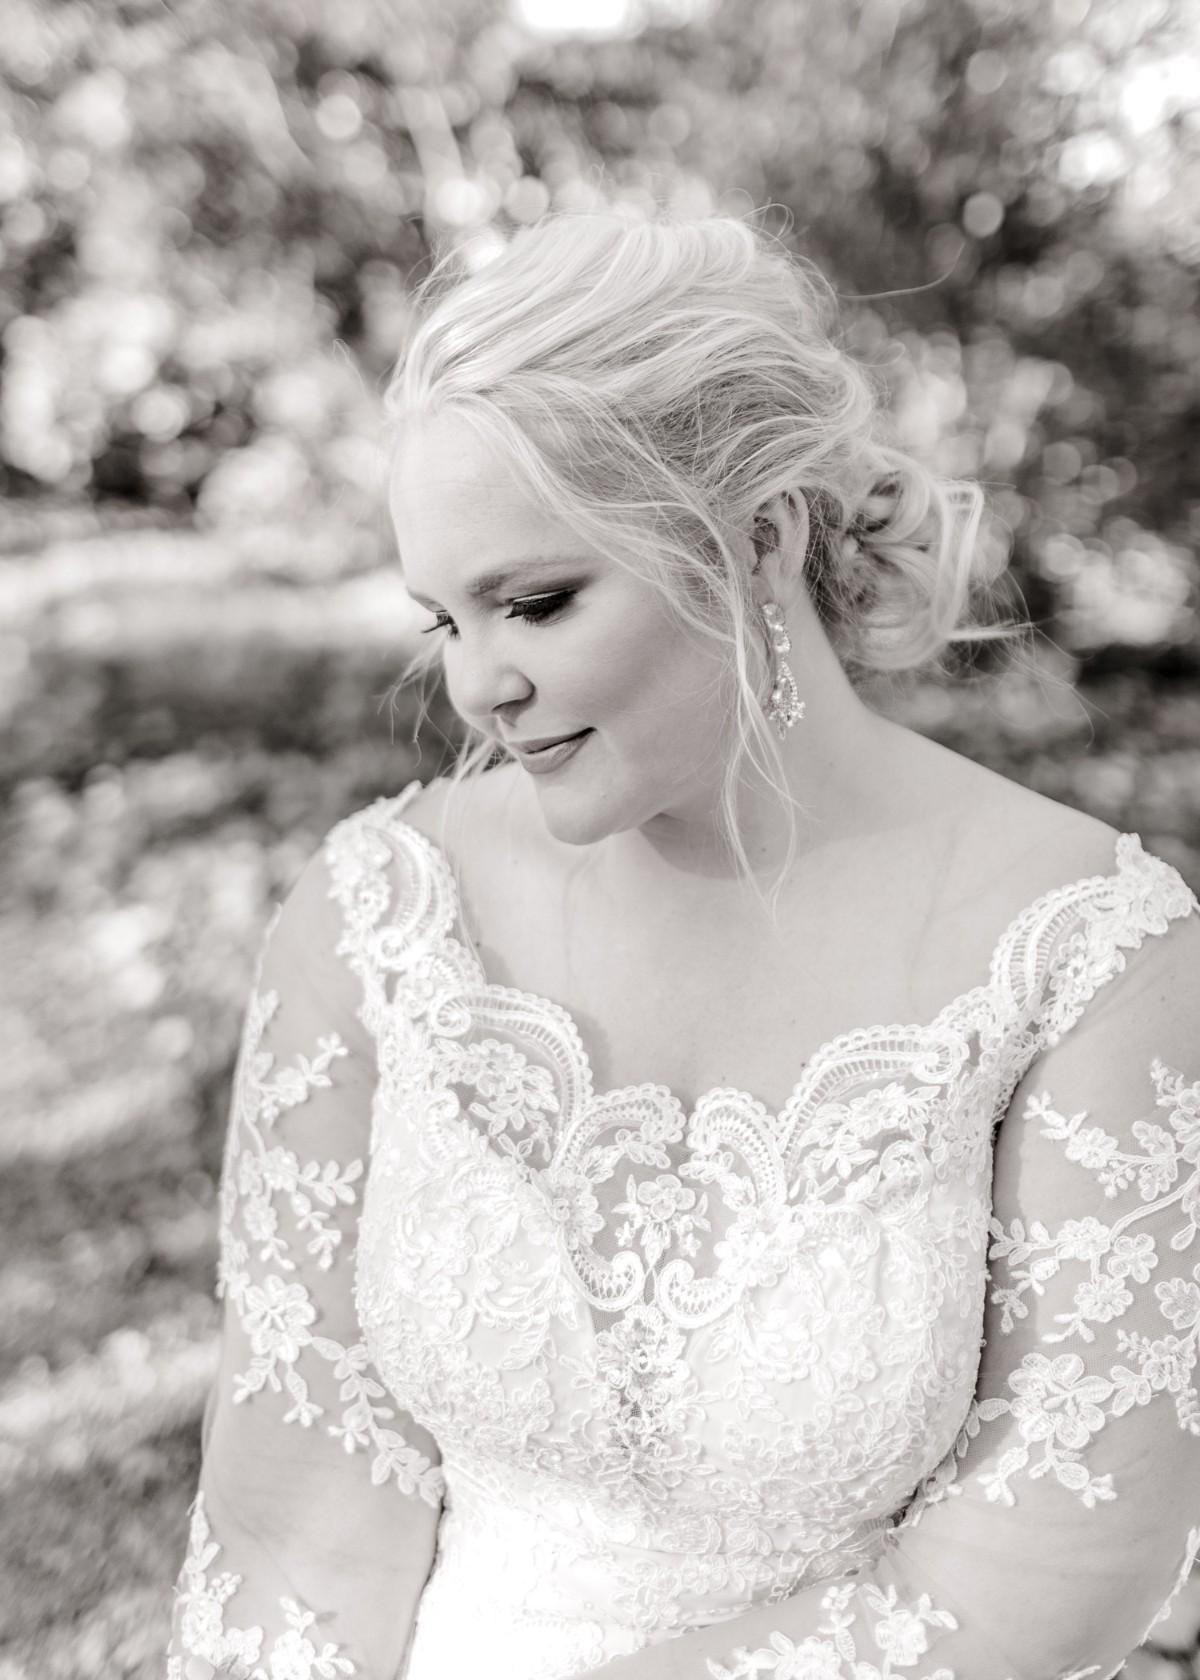 casidy-bridals-tradinghouse-lake-waco-wedding-photographer-kaitlyn-bullard-01.jpg